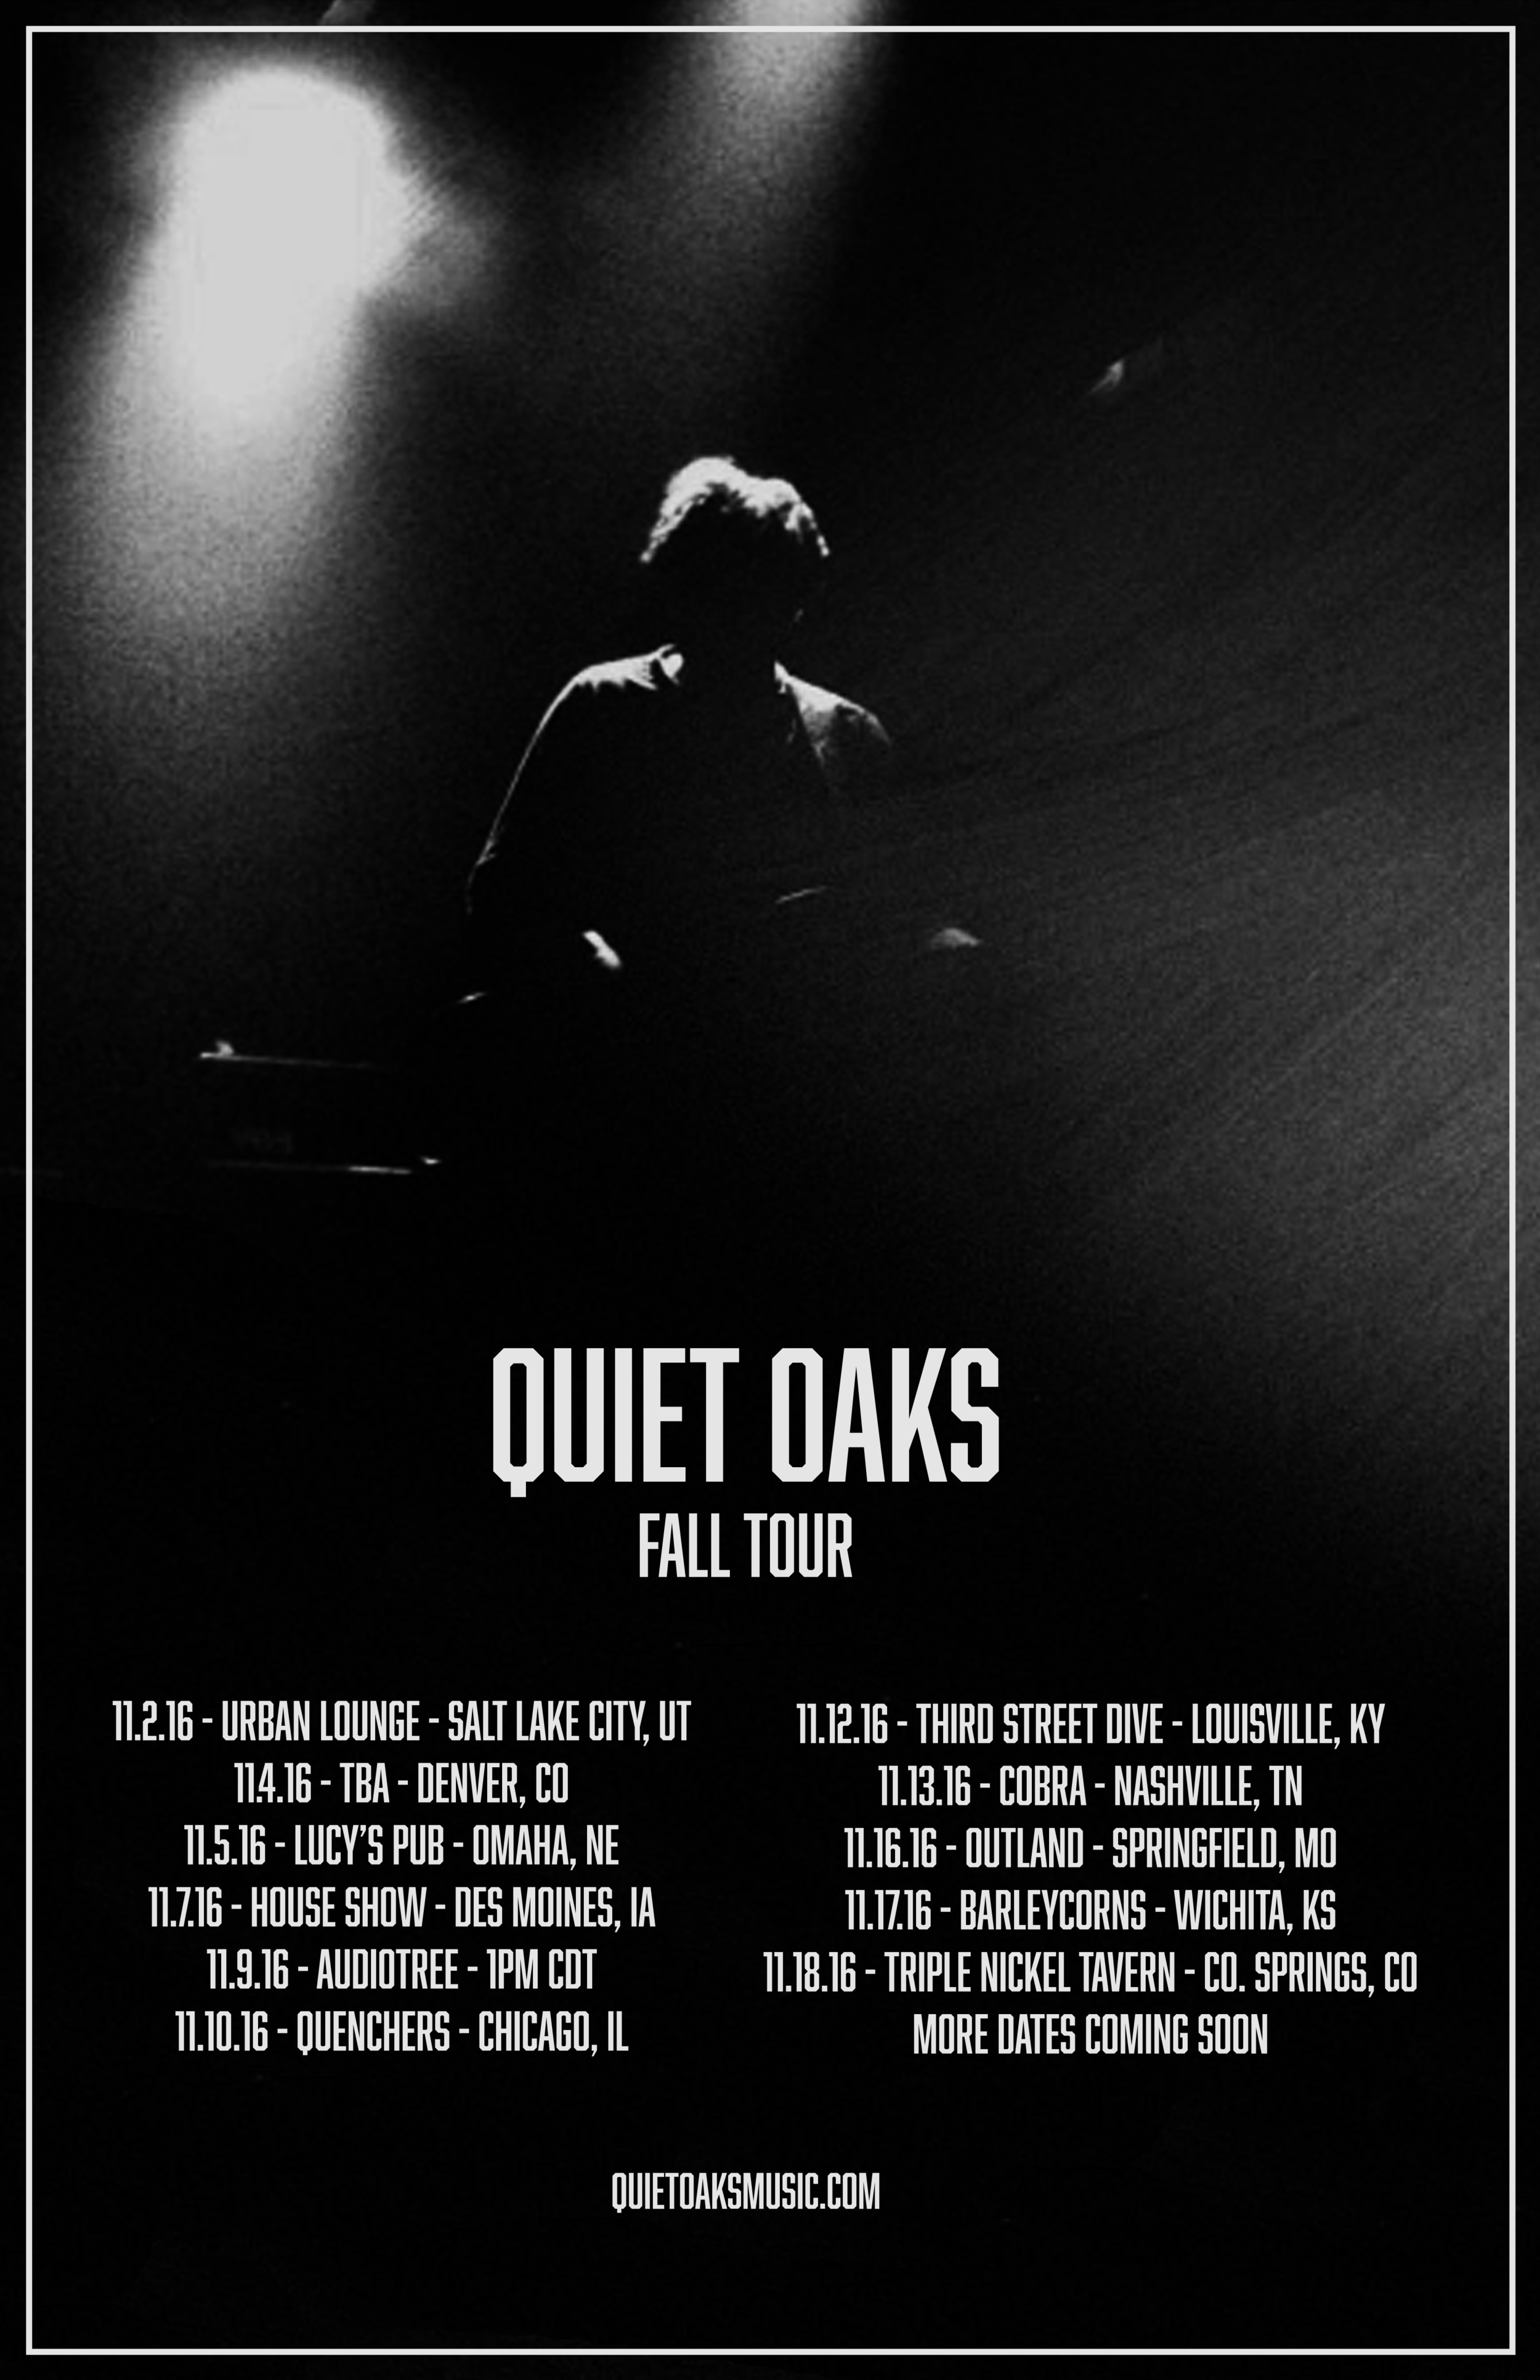 FALL TOUR 2016    11.2.16 - Urban Lounge - Salt Lake City, UT   11.4.16 - TBA - Denver, CO   11.5.16 - Lucy's Pub - Omaha, NE   11.7.16 - House Show - Des Moines, IA 11.9.16 - AUDIOTREE - 1pm CDT 11.10.16 - Quenchers - Chicago, IL 11.12.16 - Third Street Dive - Louisville, KY 11.13.16 - Cobra - Nashville, TN 11.16.16 - Outland - Springfield, MO 11.17.16 - Barleycorn's - Wichita, KS 11.18.16 - Triple Nickel Tavern - Colorado Springs, CO  More Dates Coming Soon!